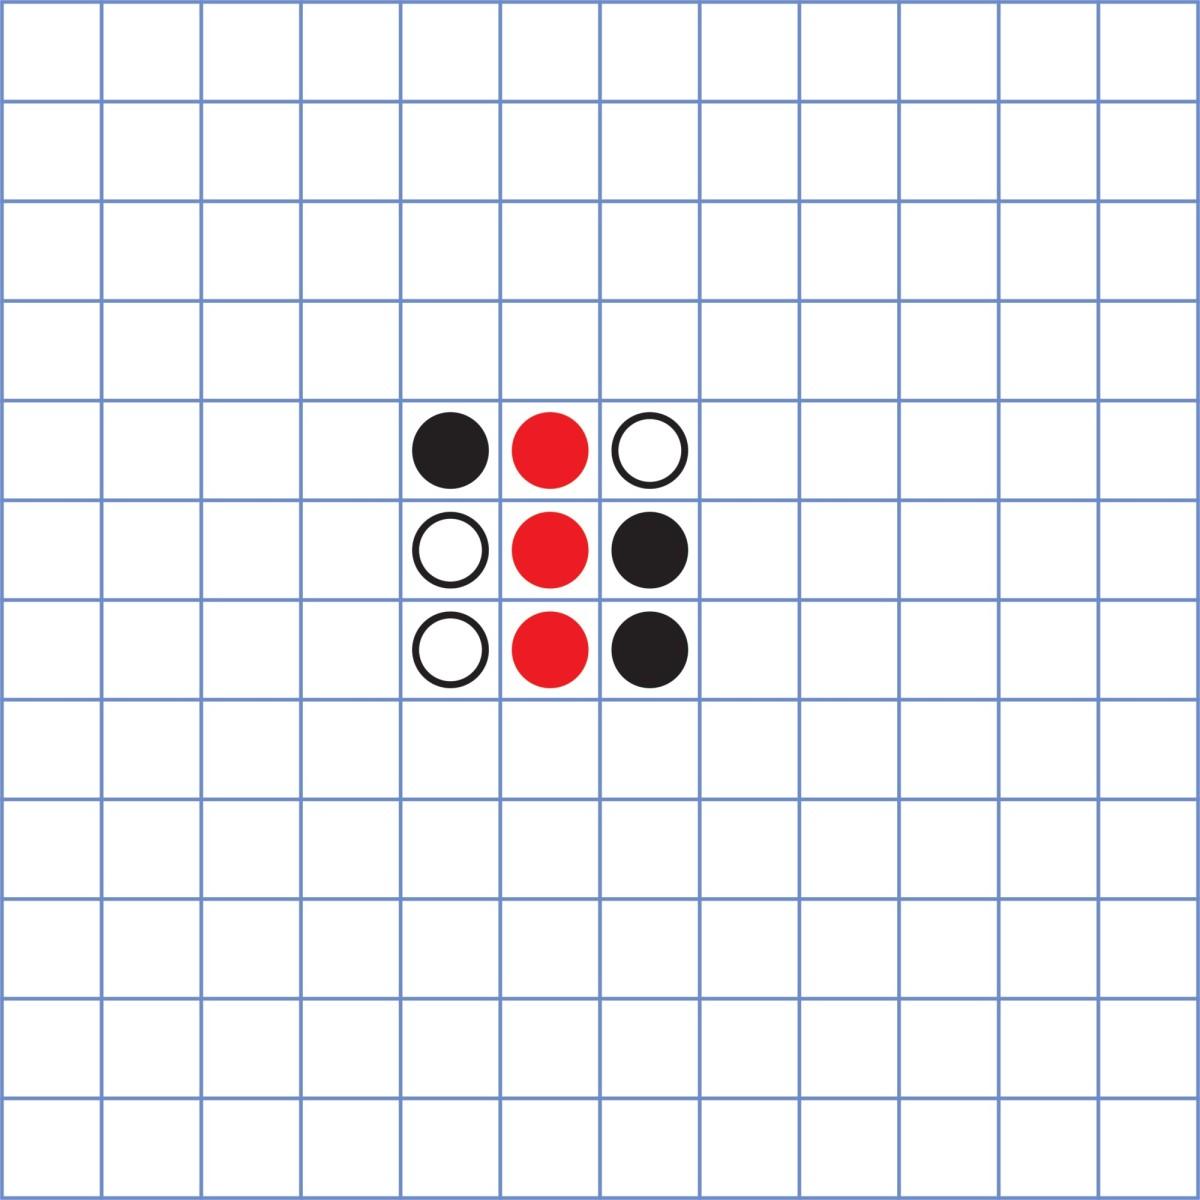 Figure 8: Challenge 2.